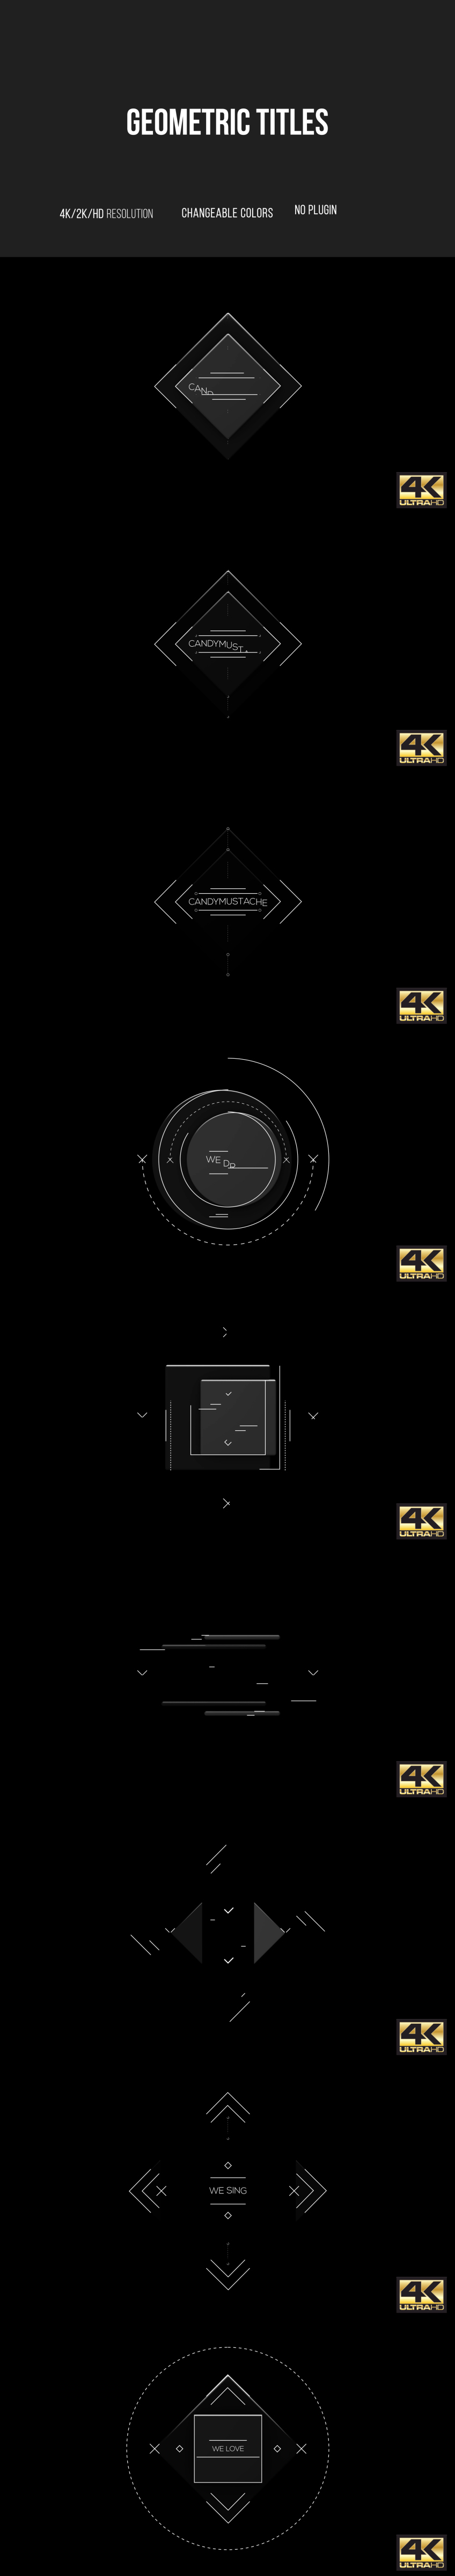 0082_Frame_Geometric_Titles